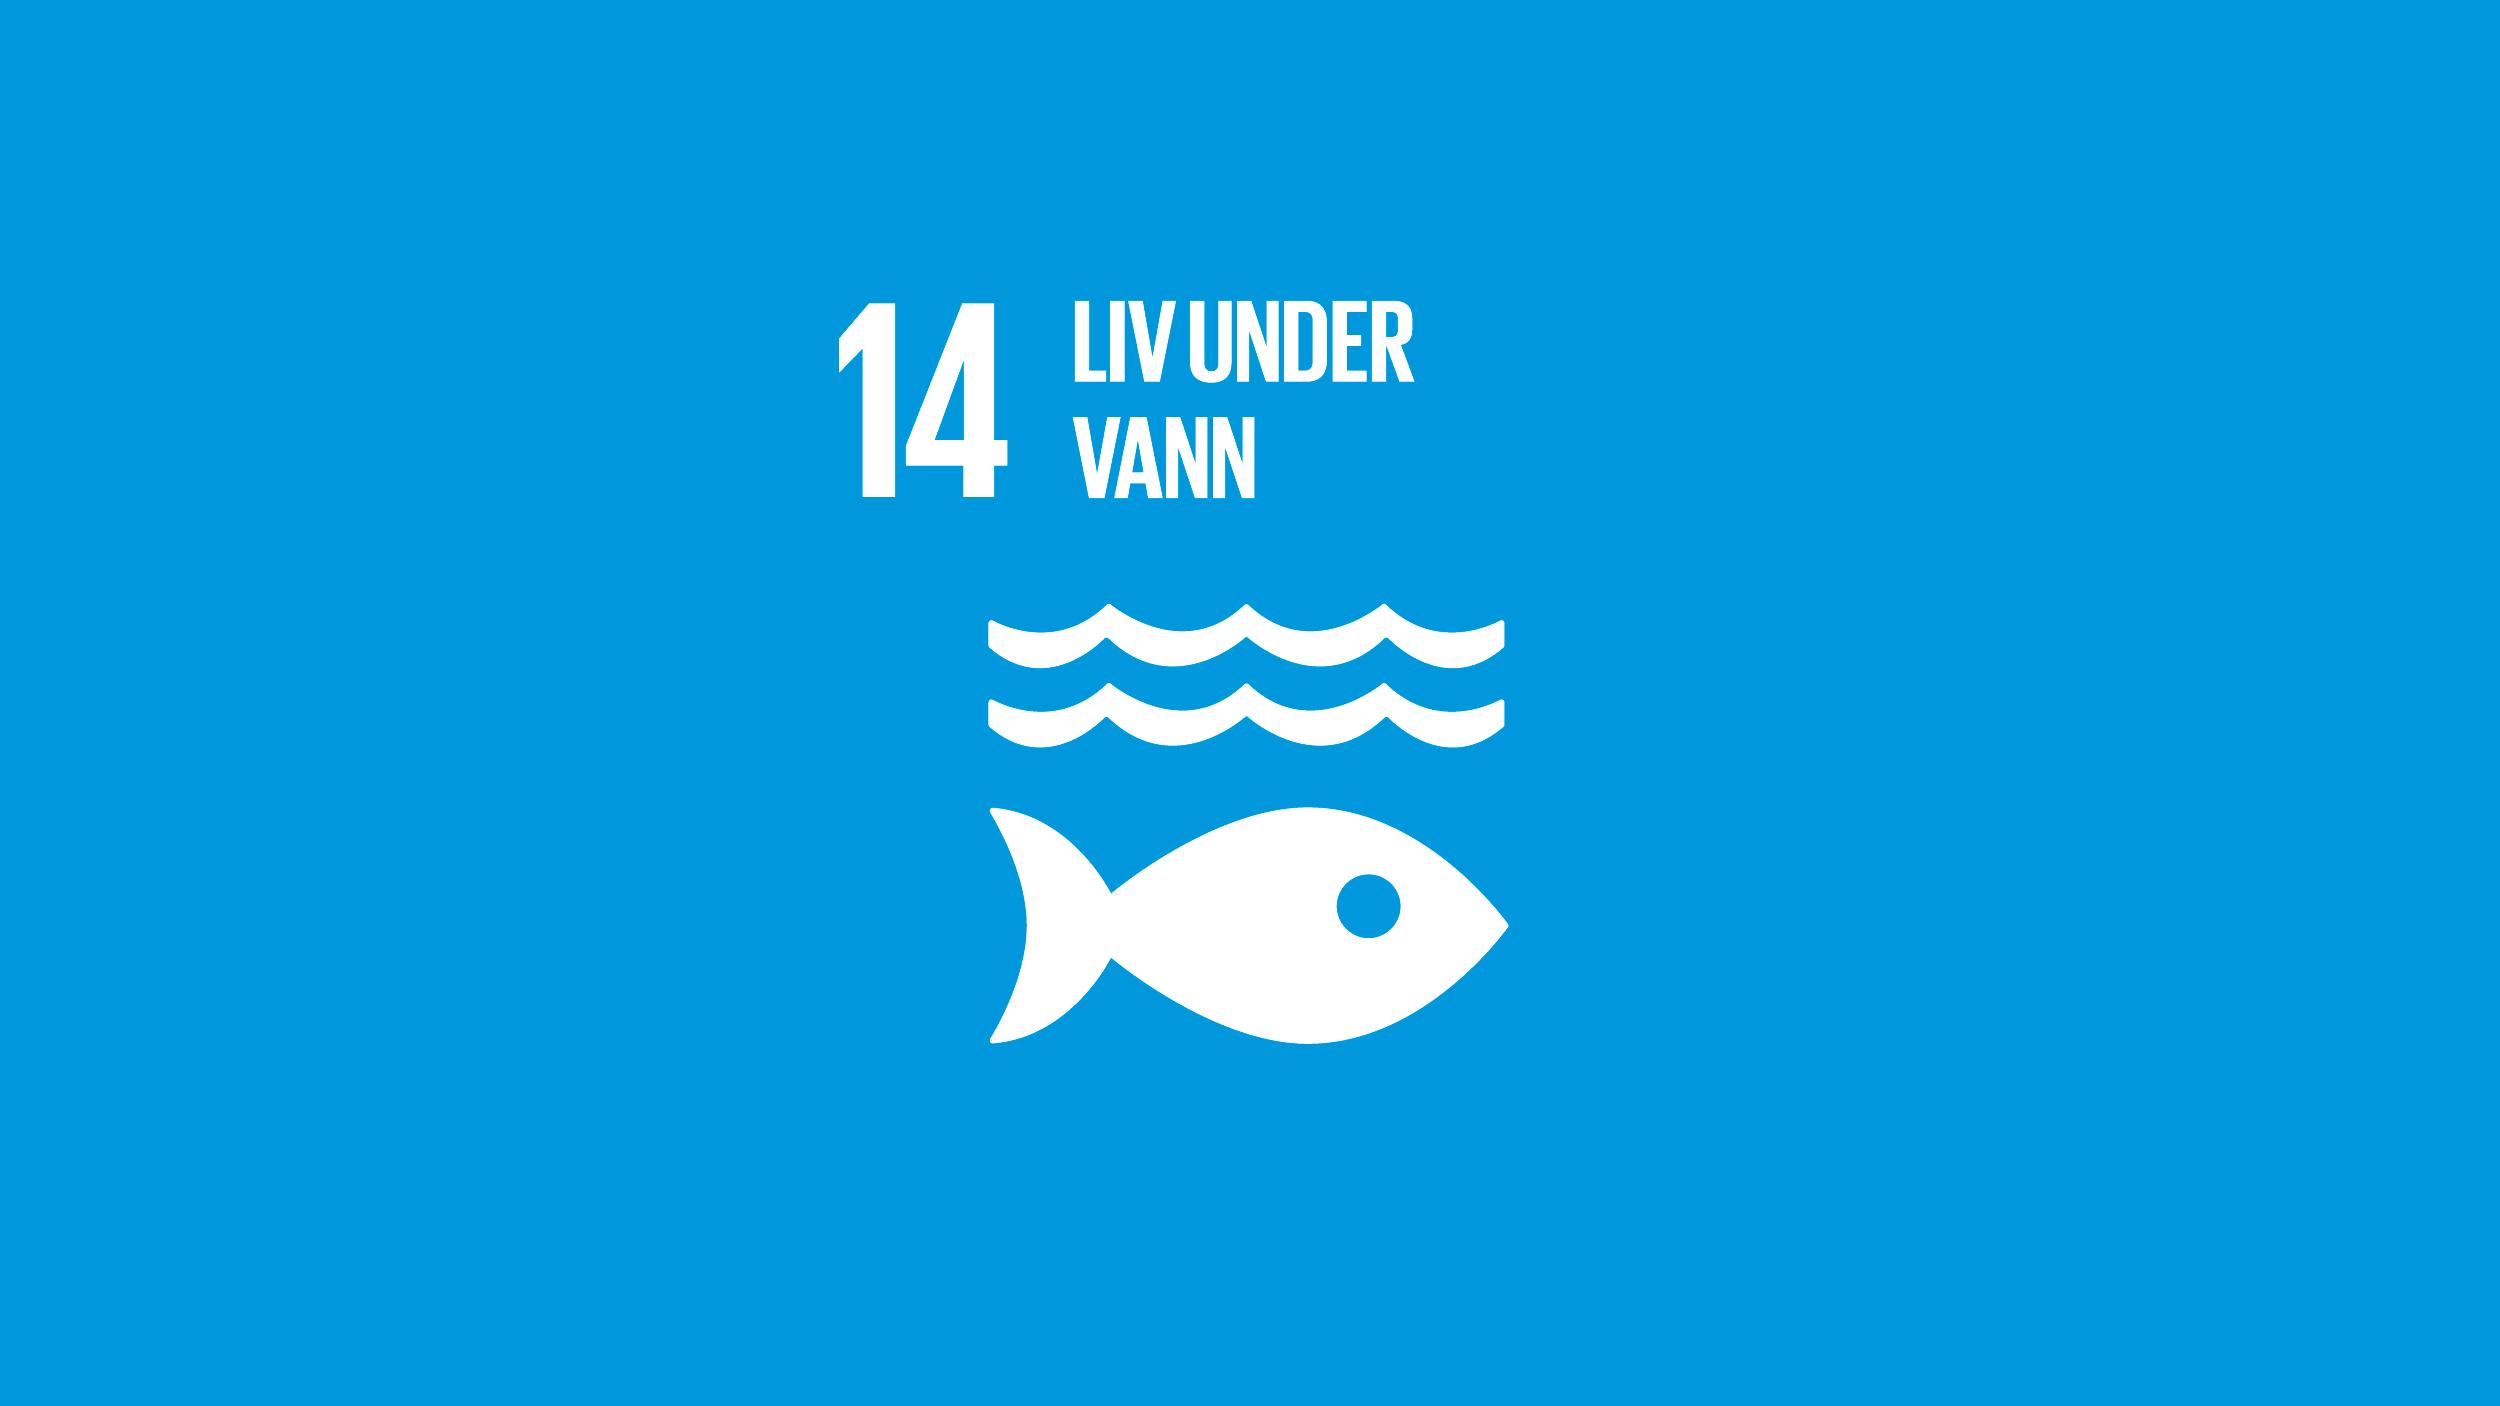 14 Liv under vann.png